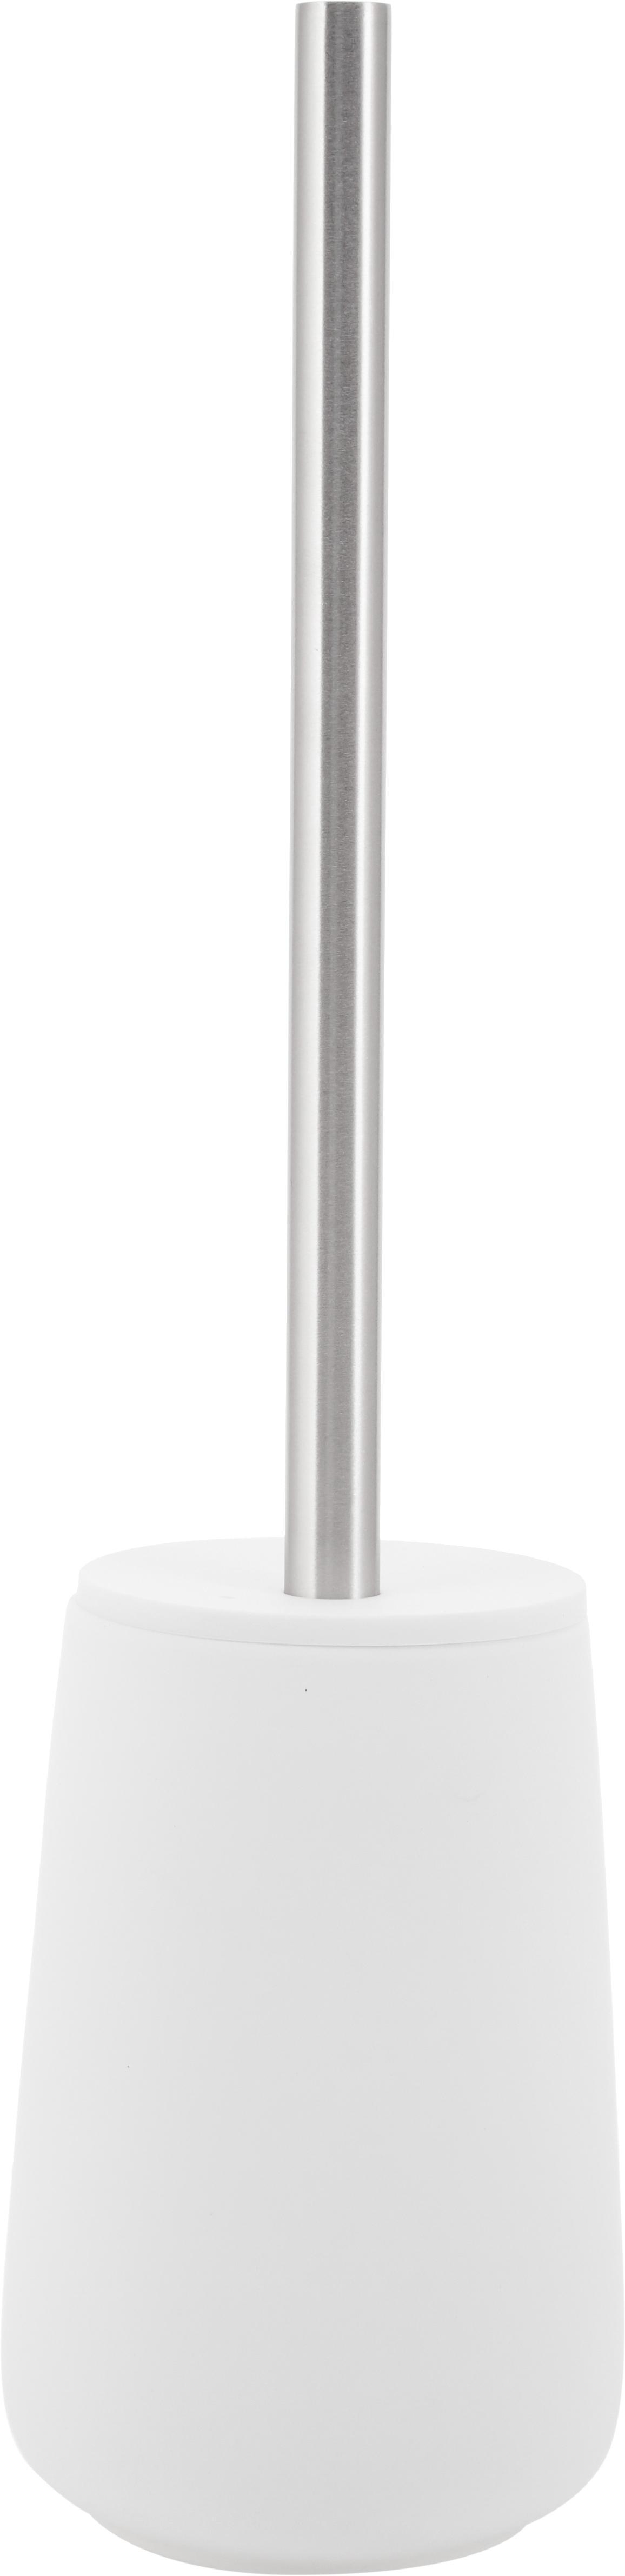 Toilettenbürste Nova mit Porzellan-Behälter, Behälter: Porzellan, Griff: Edelstahl, Weiss matt, Edelstahl, Ø 10 x H 43 cm